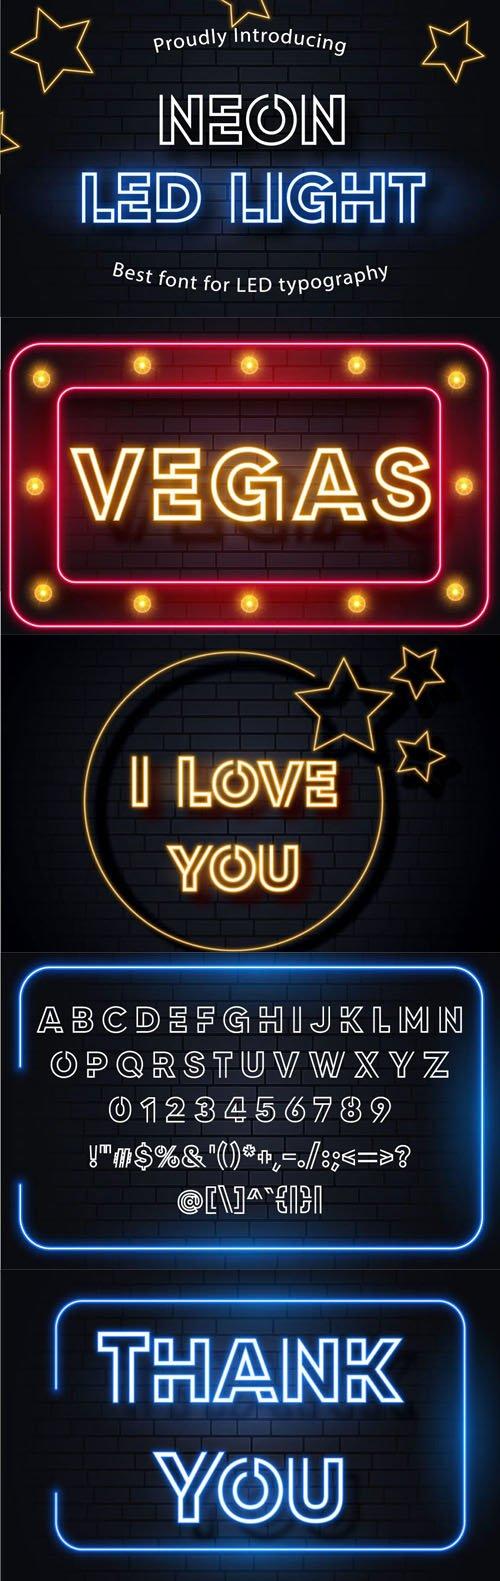 Neon Led Light Display Font